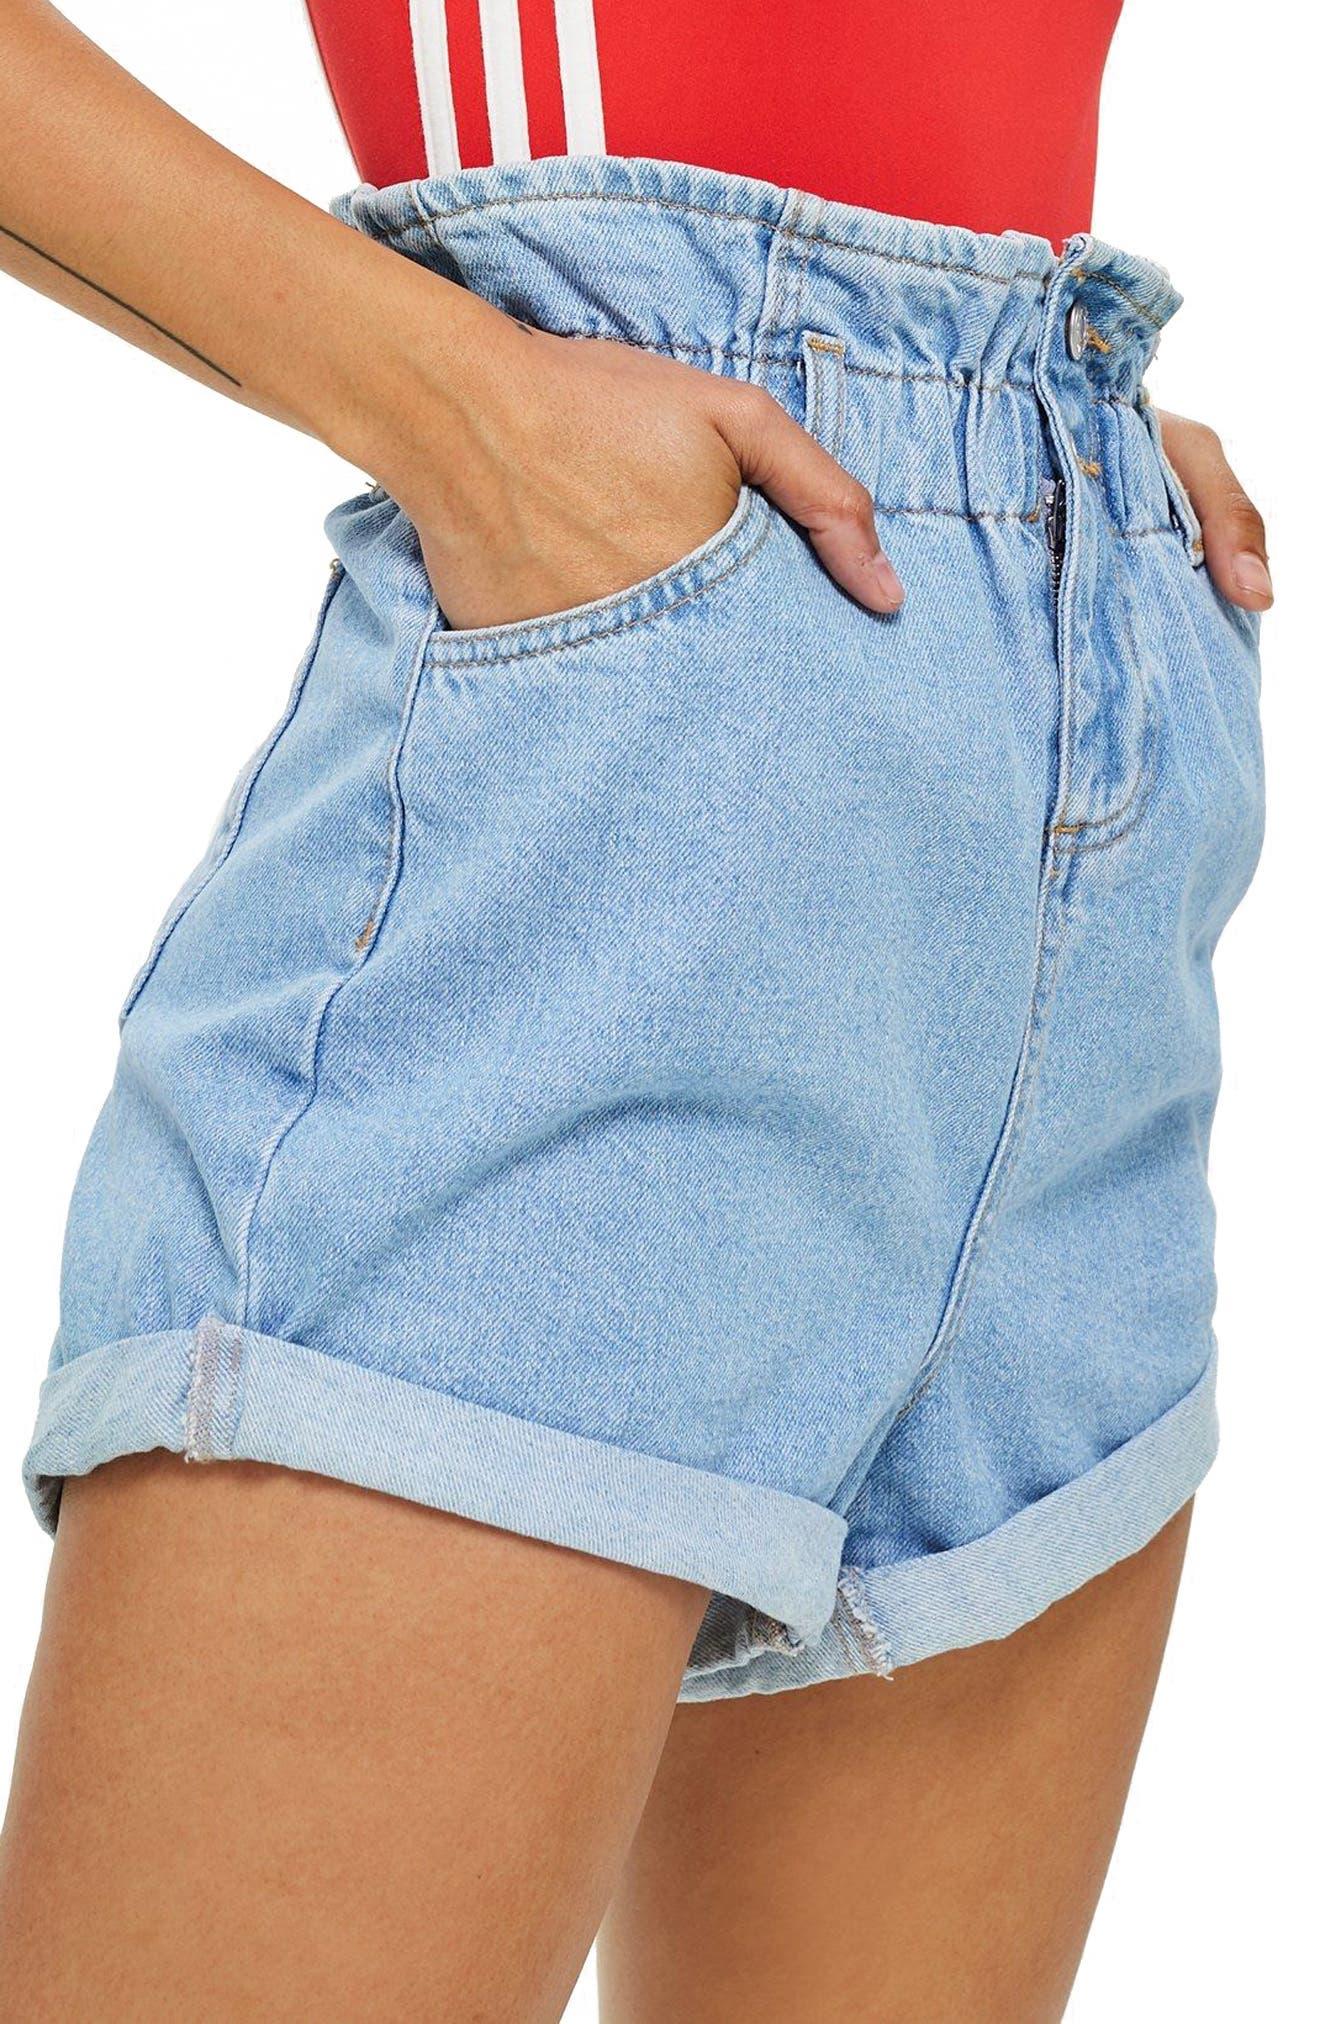 MOTO Paperbag Waist Denim Shorts,                             Main thumbnail 1, color,                             Mid Stone